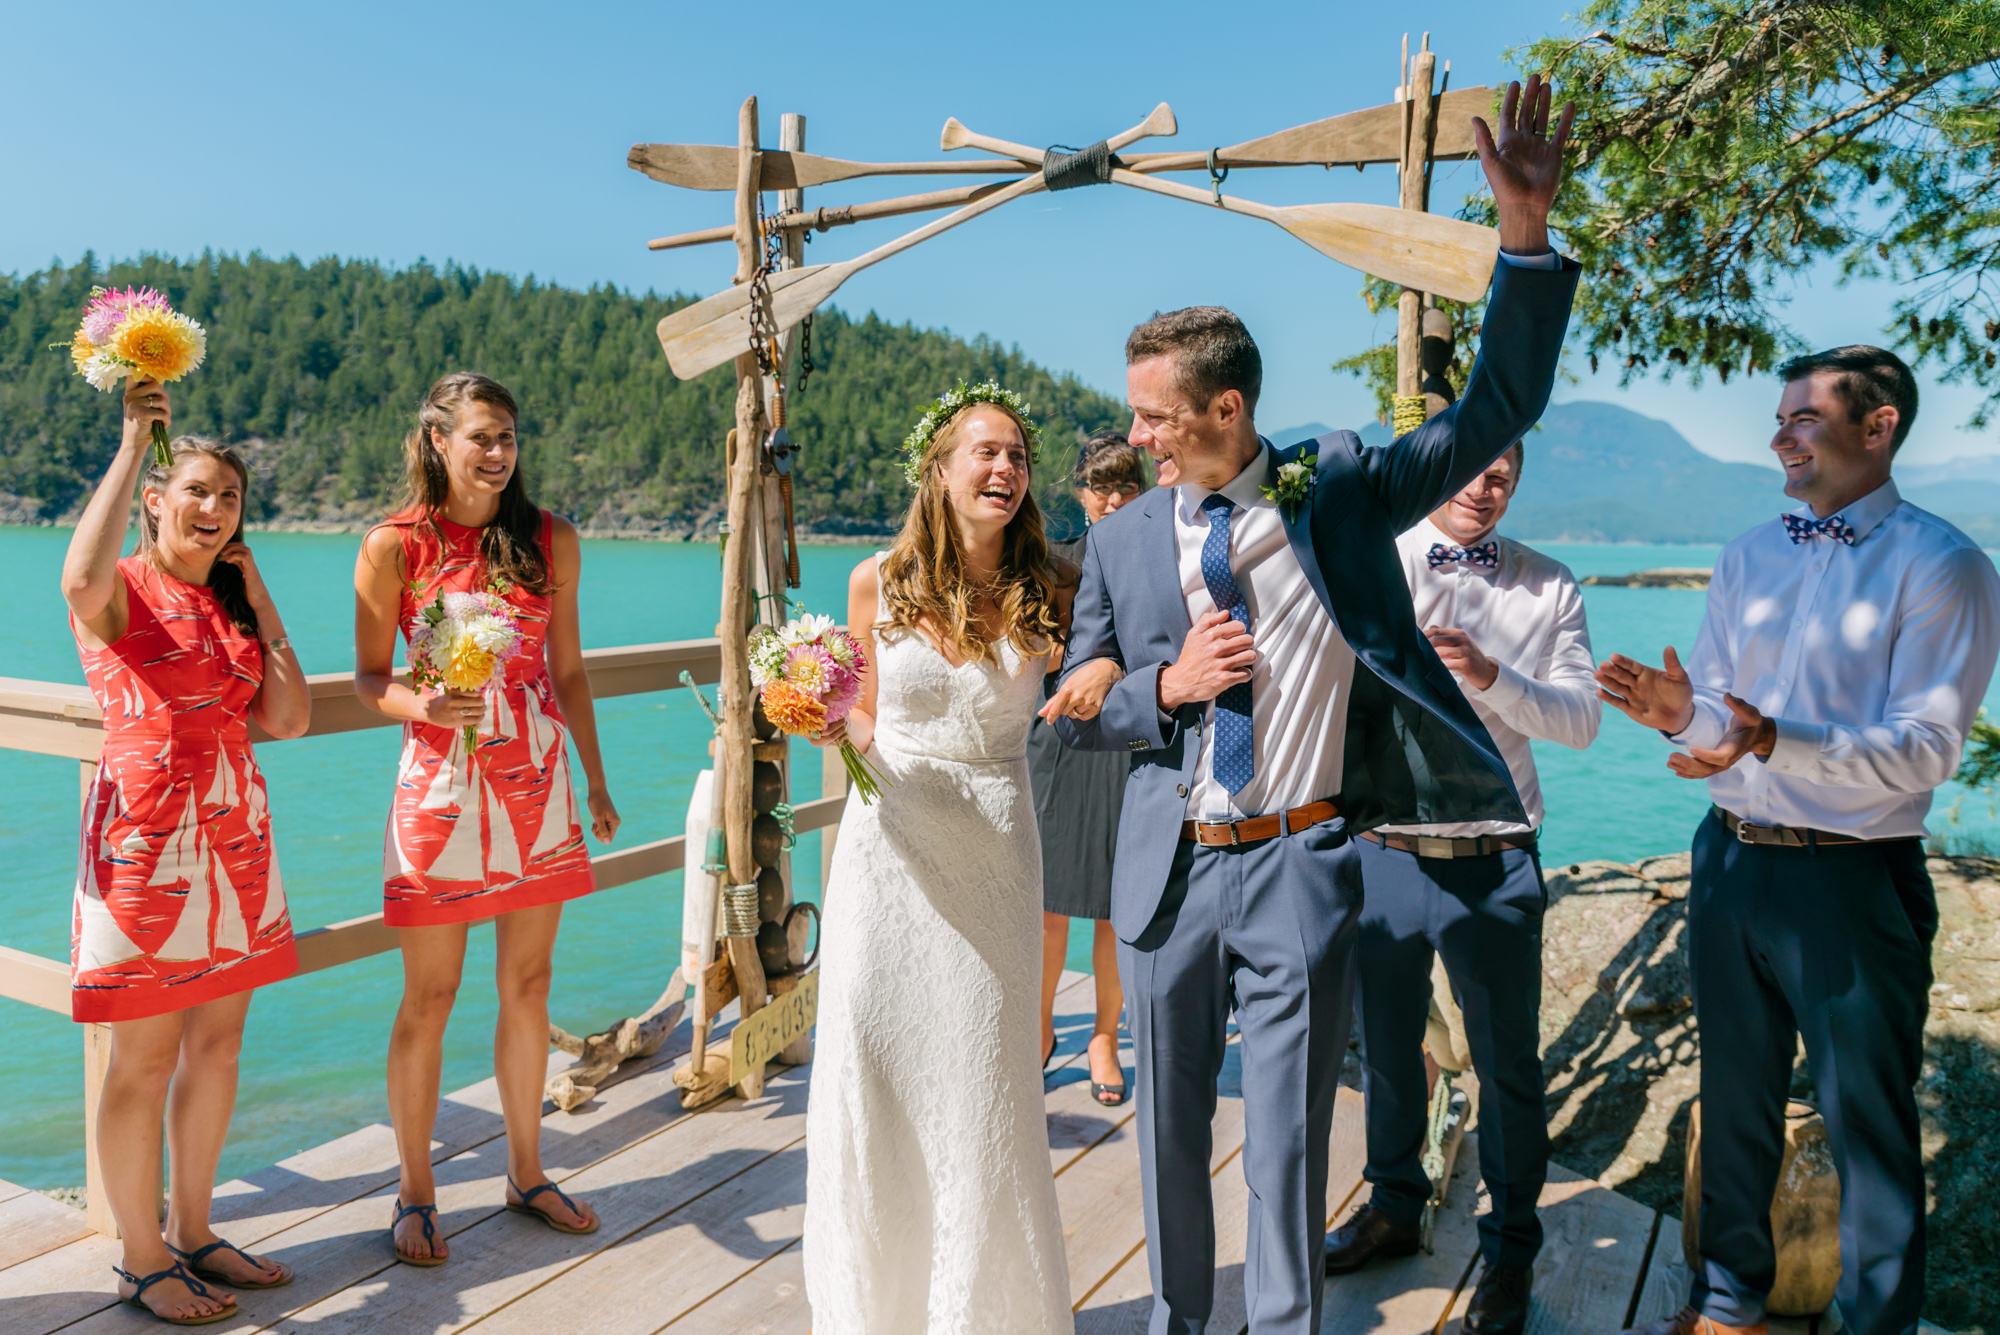 bowen_island_wedding_photographer_vancouver143314_22_ally&james.jpg